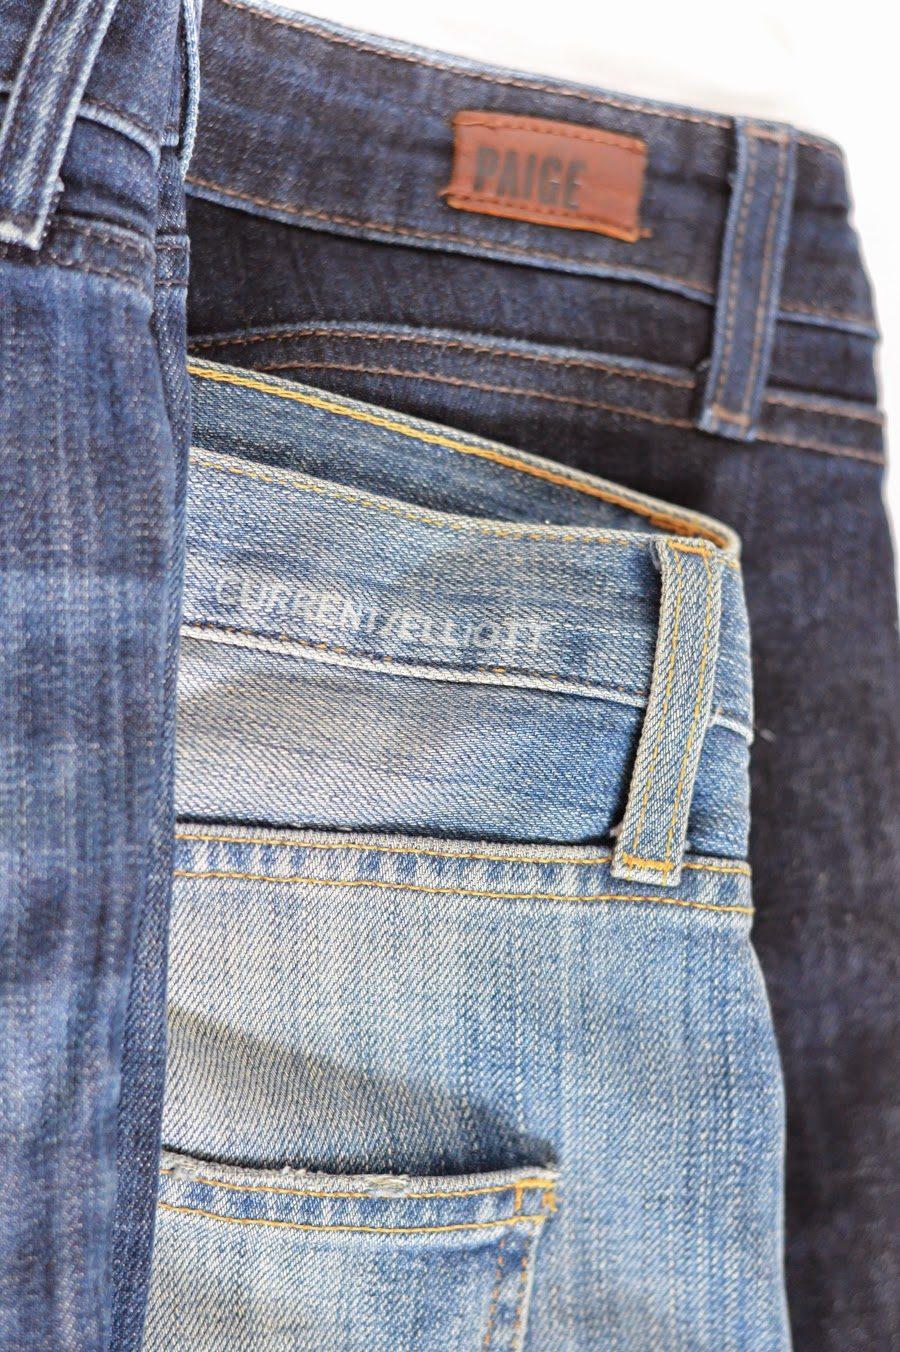 Should you Wash Jeans?